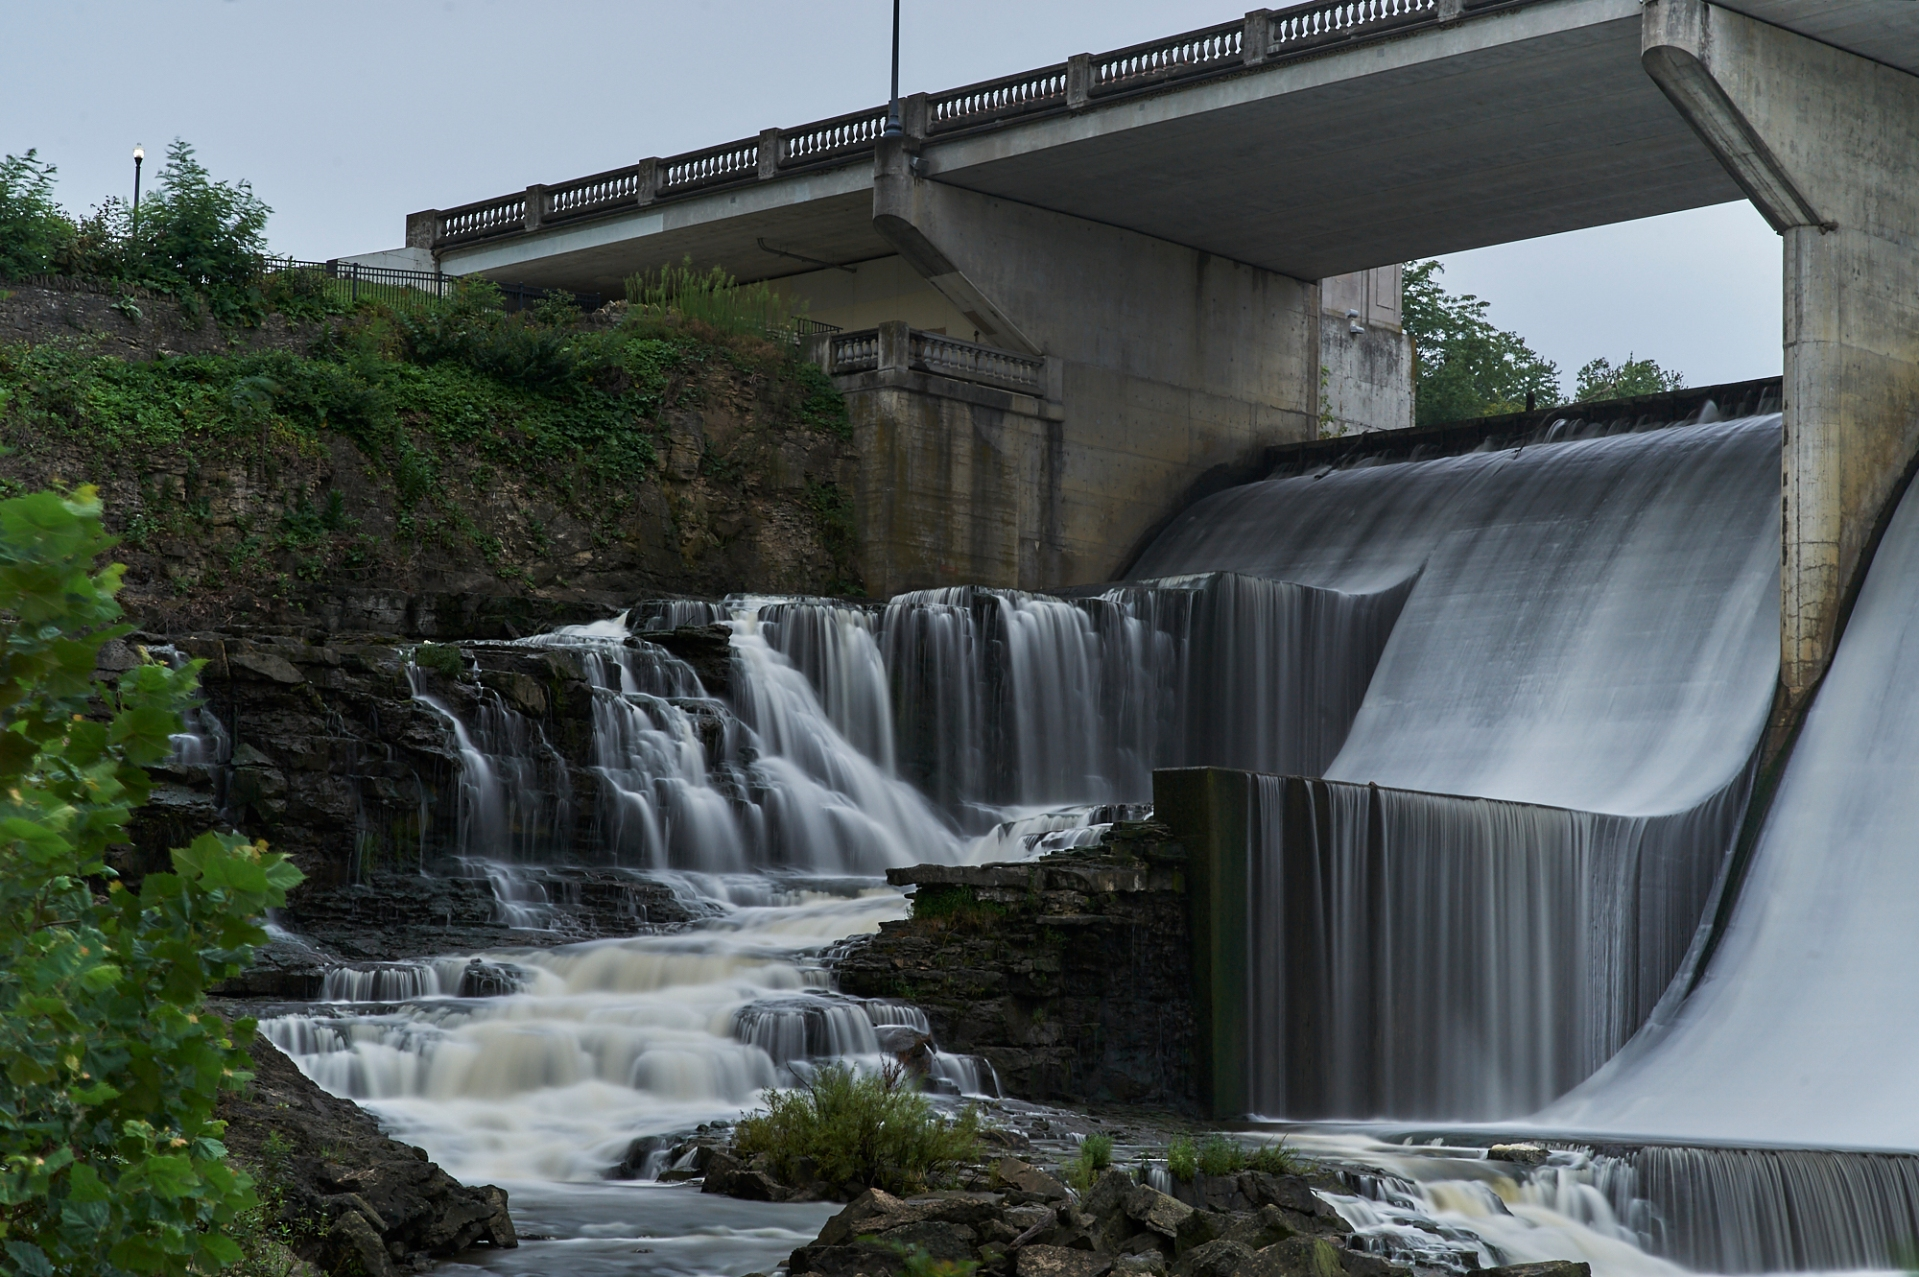 Tamron-24-70-G2-Review-Scioto-River-Dam-2